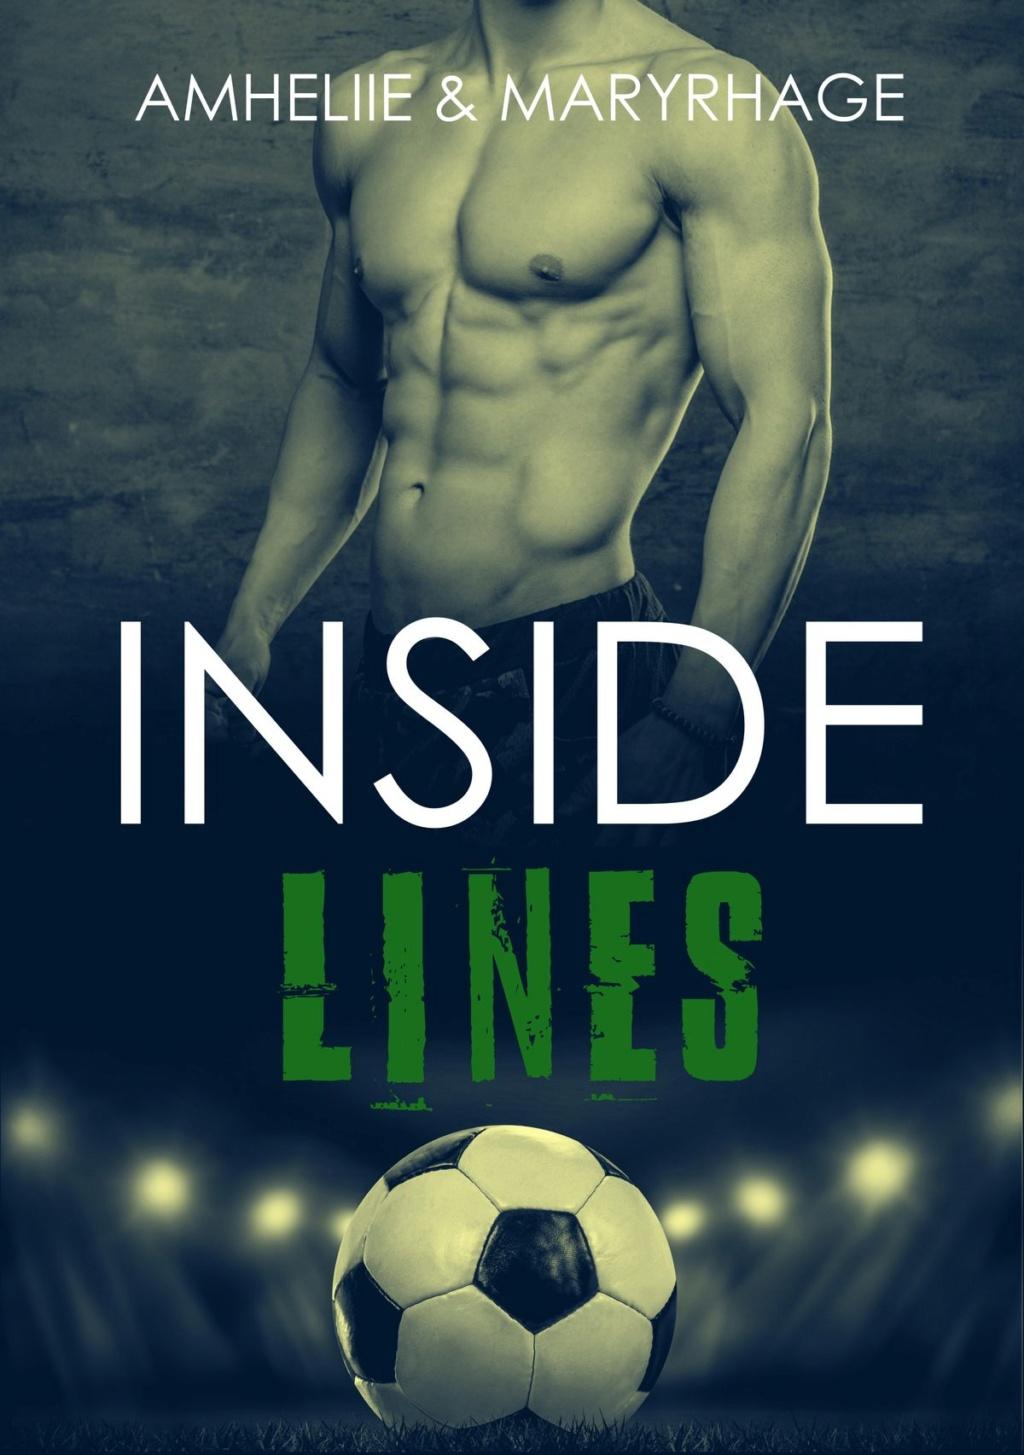 AMHELIIE & MARYRHAGE - Inside Lines Inside10